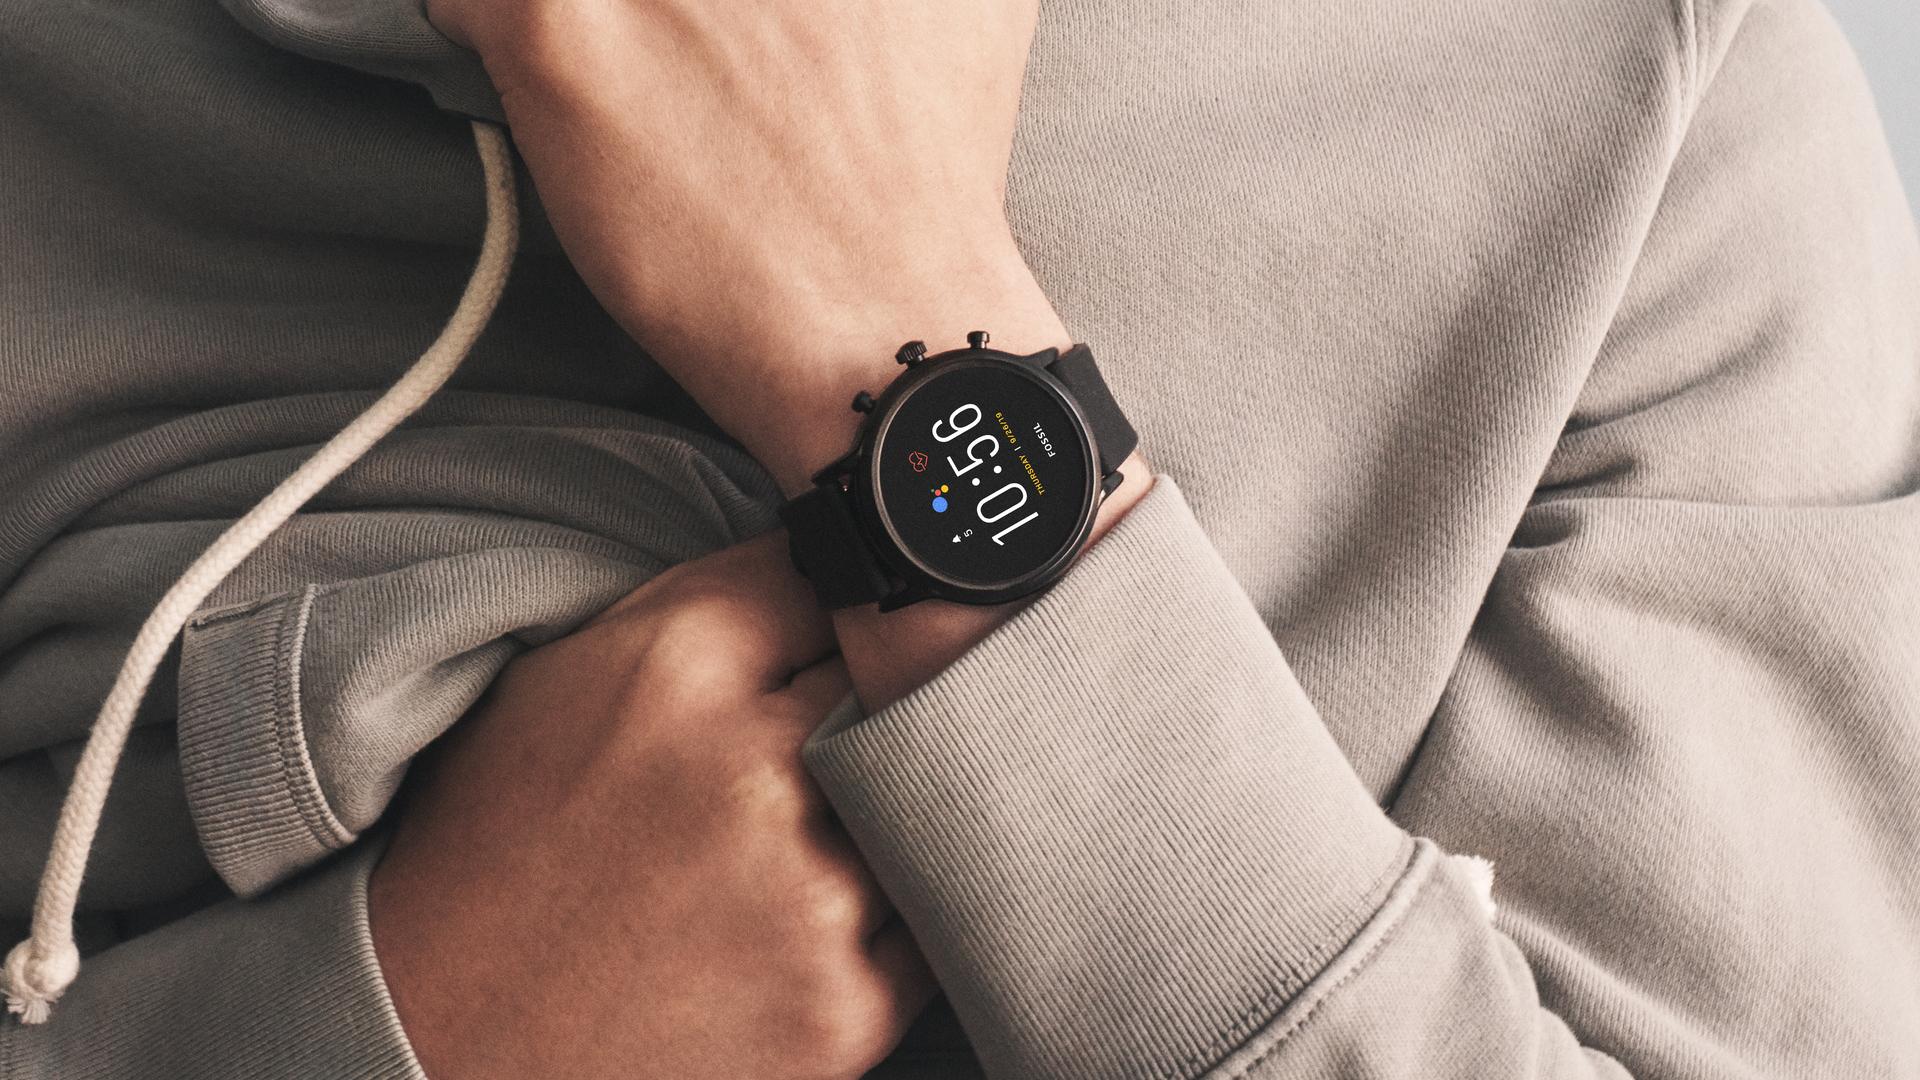 fossil generation 5 wear os smartwatch